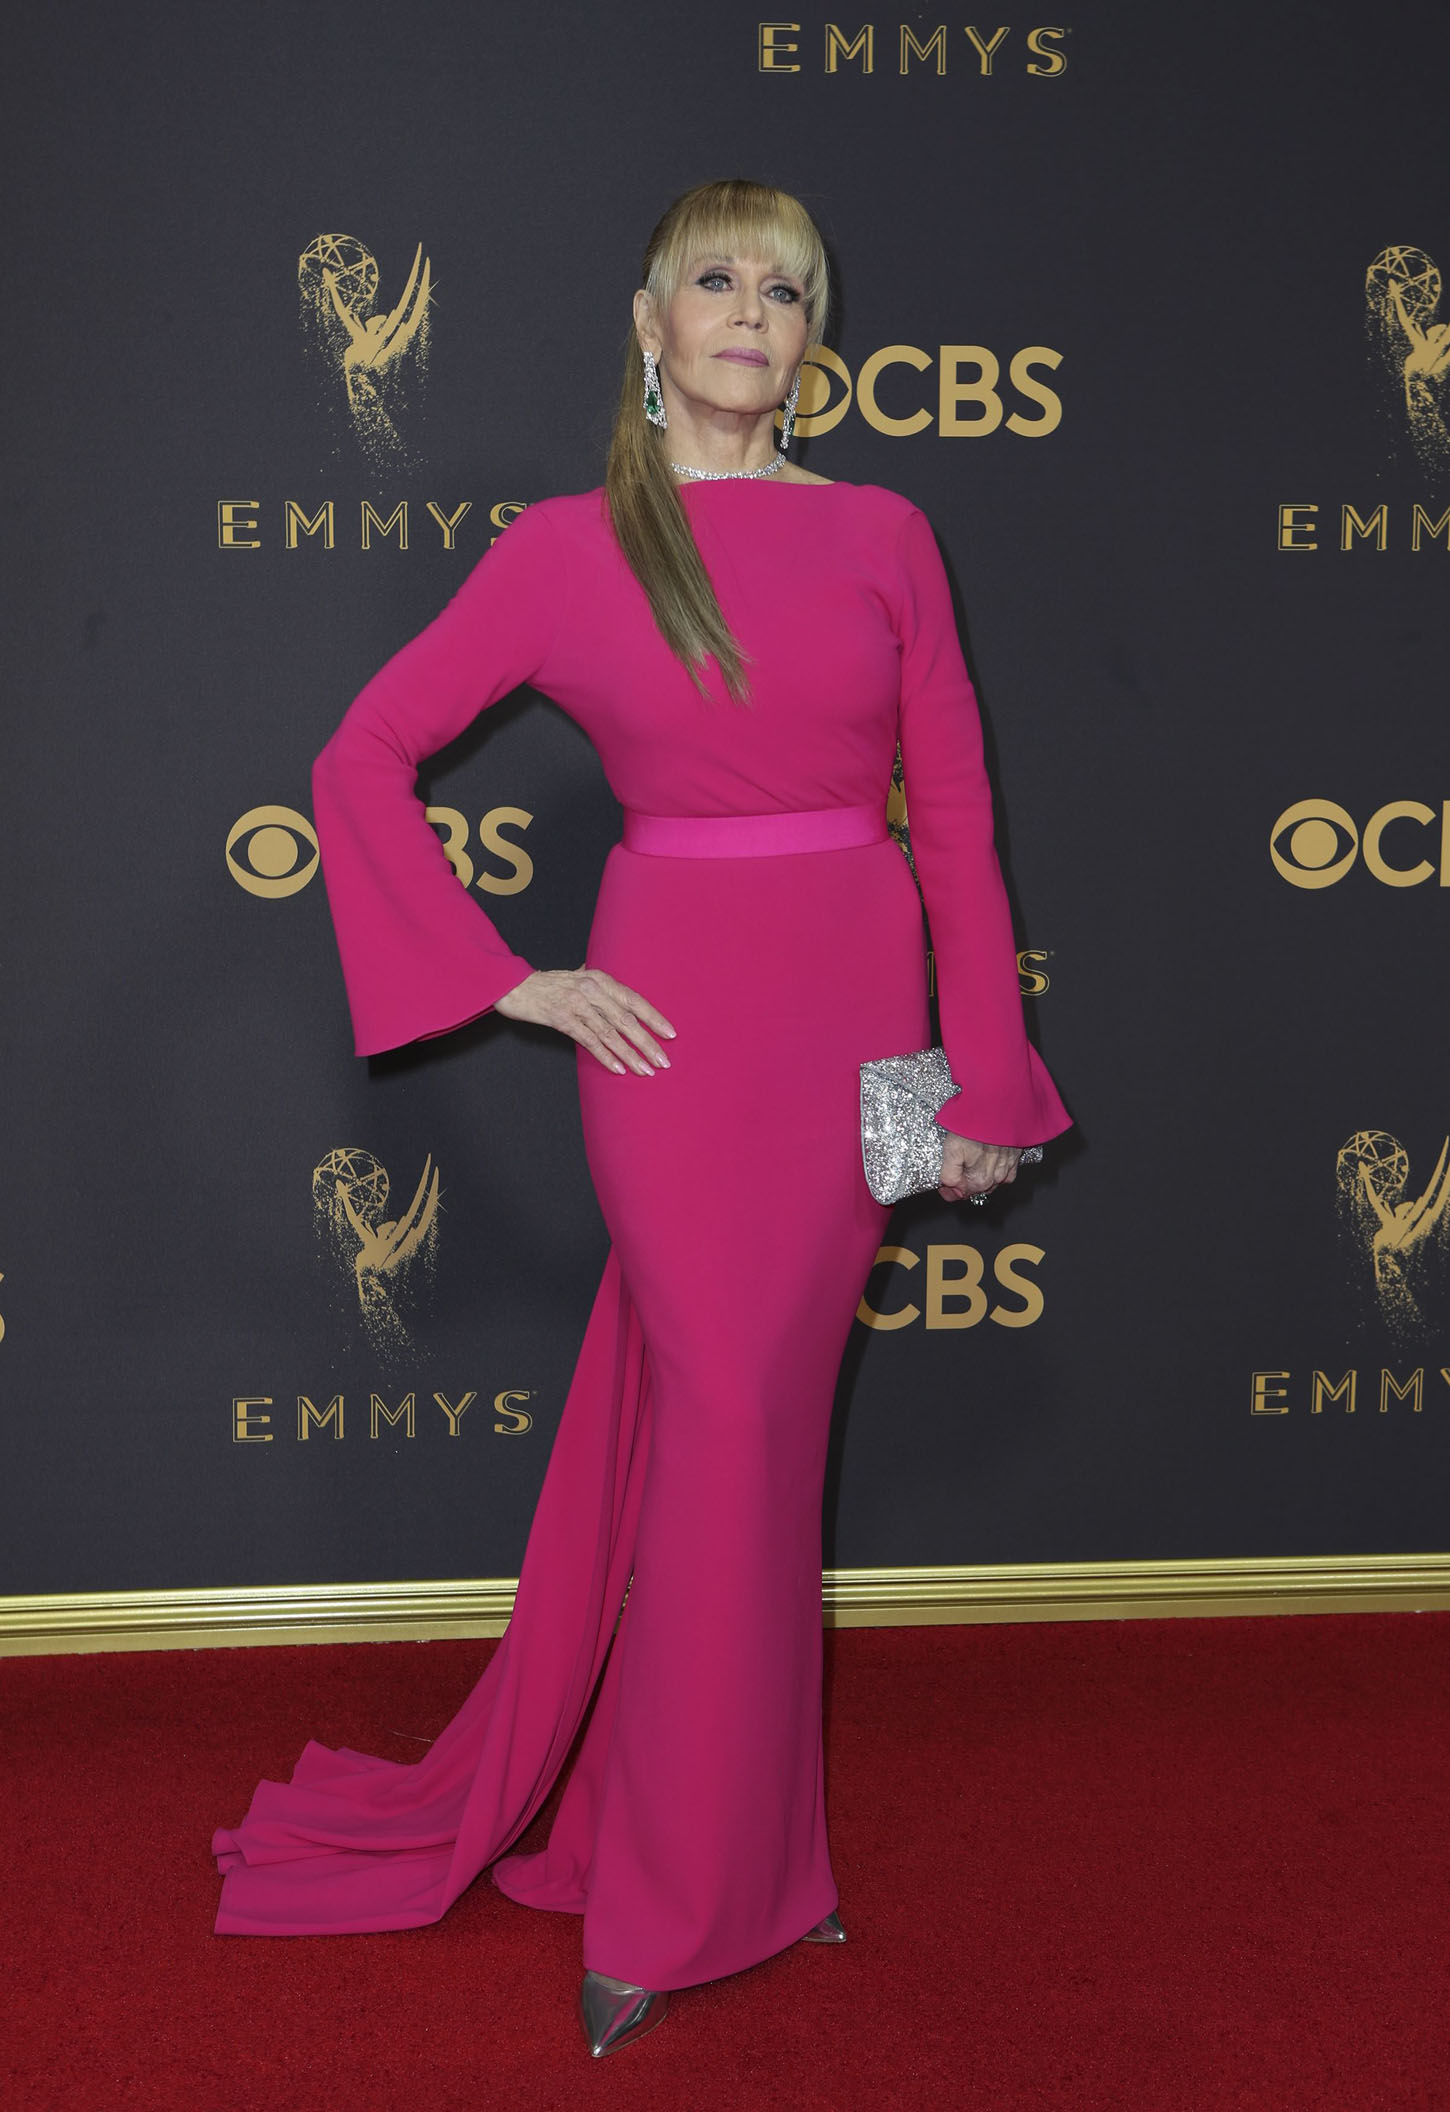 69th Primetime Emmy Awards Äì Arrivals Äì Los Angeles, California, U.S., 17/09/2017 -  Jane Fonda. REUTERS/Mike Blake